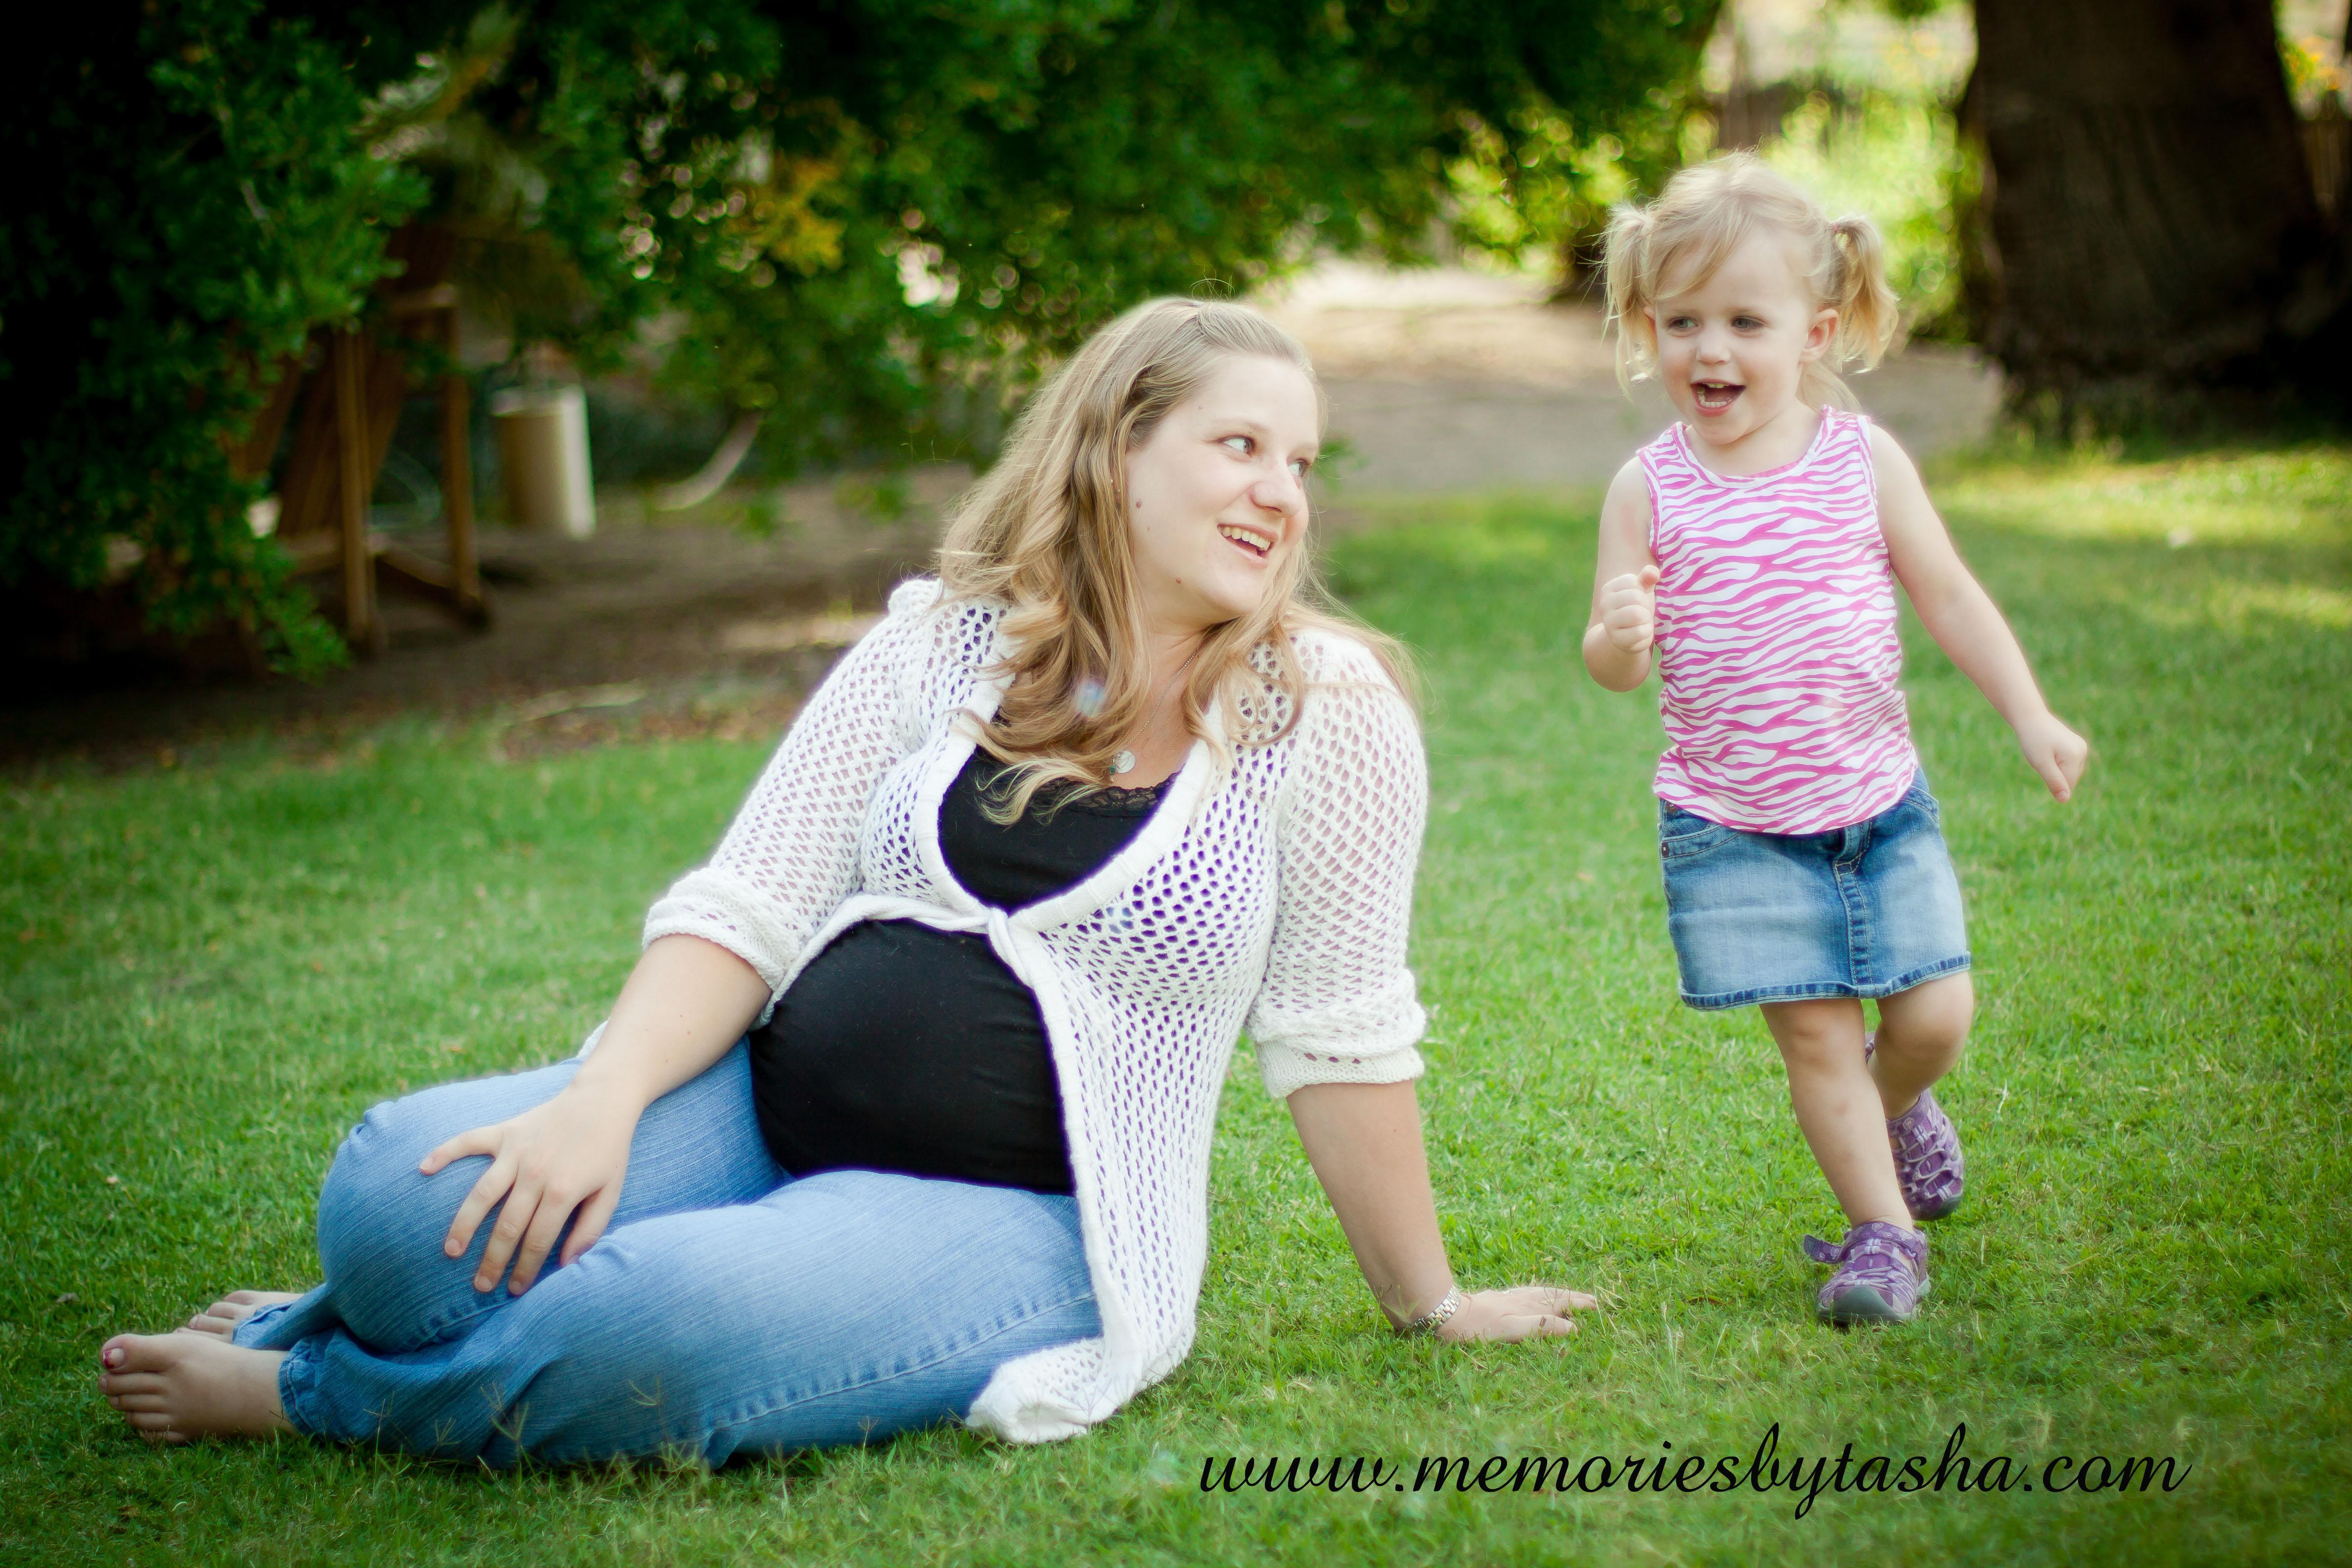 Twentynine Palms Photographer - Maternity Photography - Children's Photography - Family Photography - Pierce-06